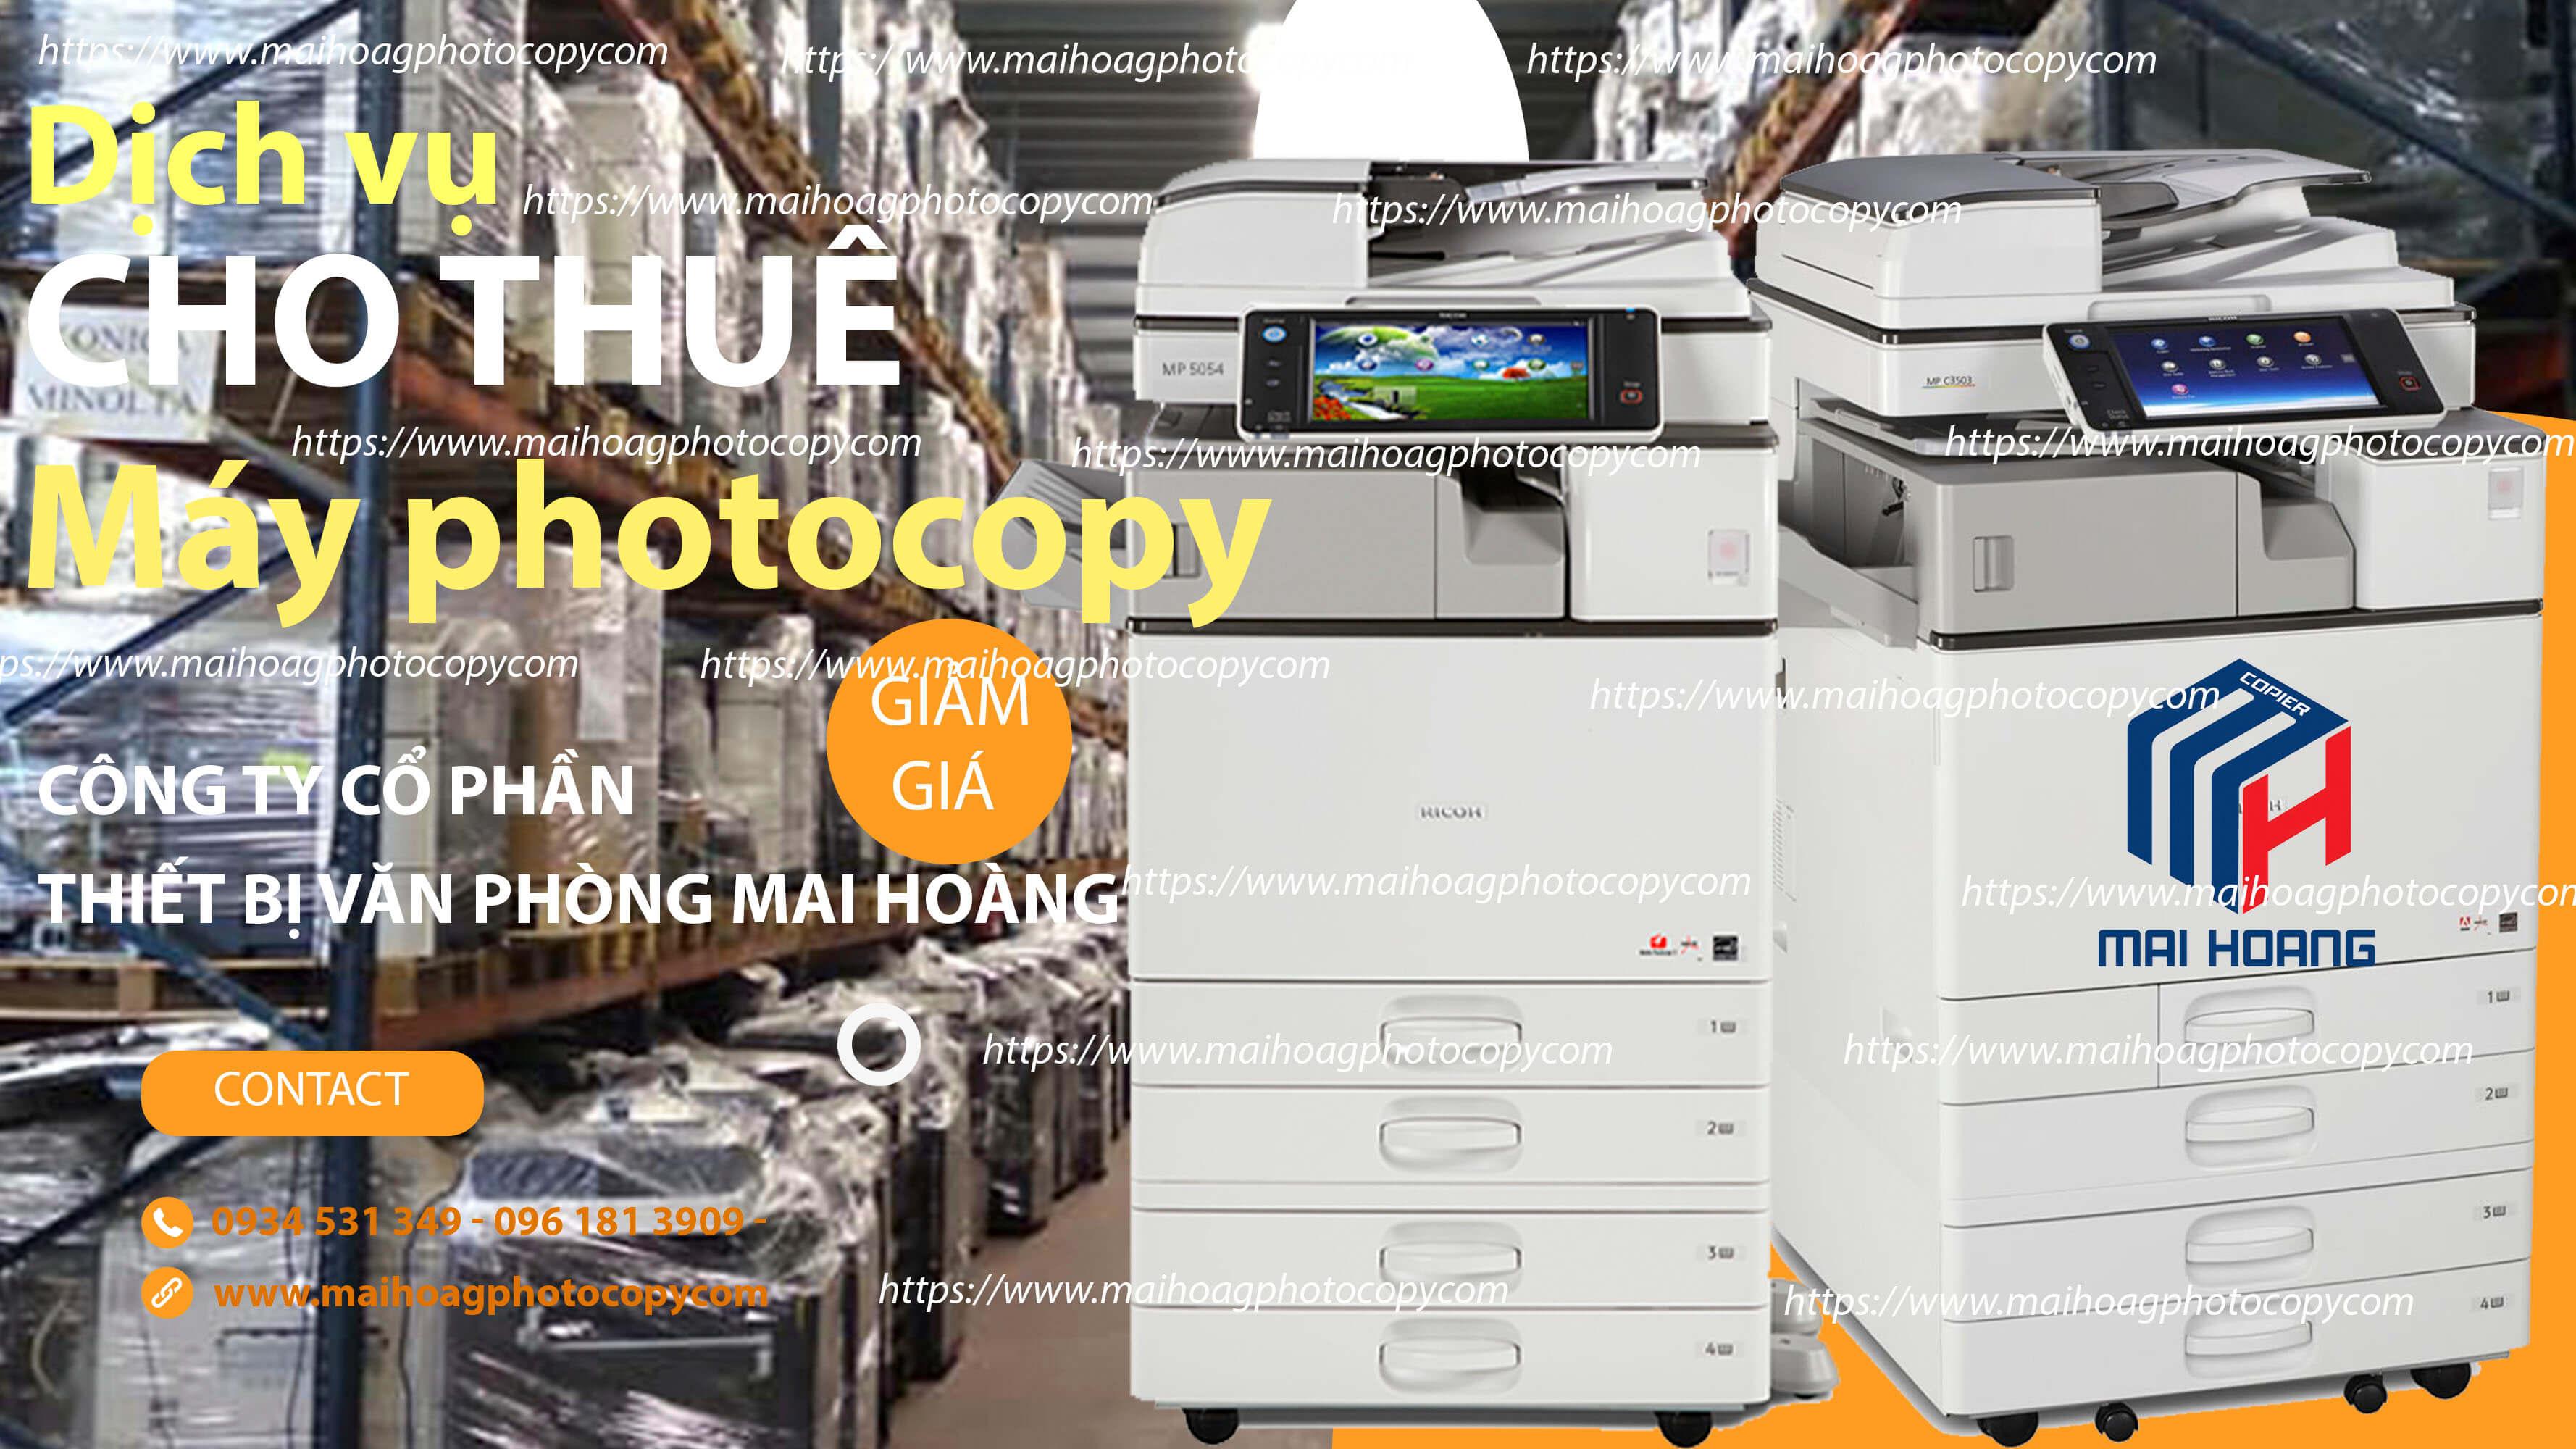 Giá Cho Thuê Máy Photocopy Màu Đa Chức Năng Ricoh Aficio MP C6503